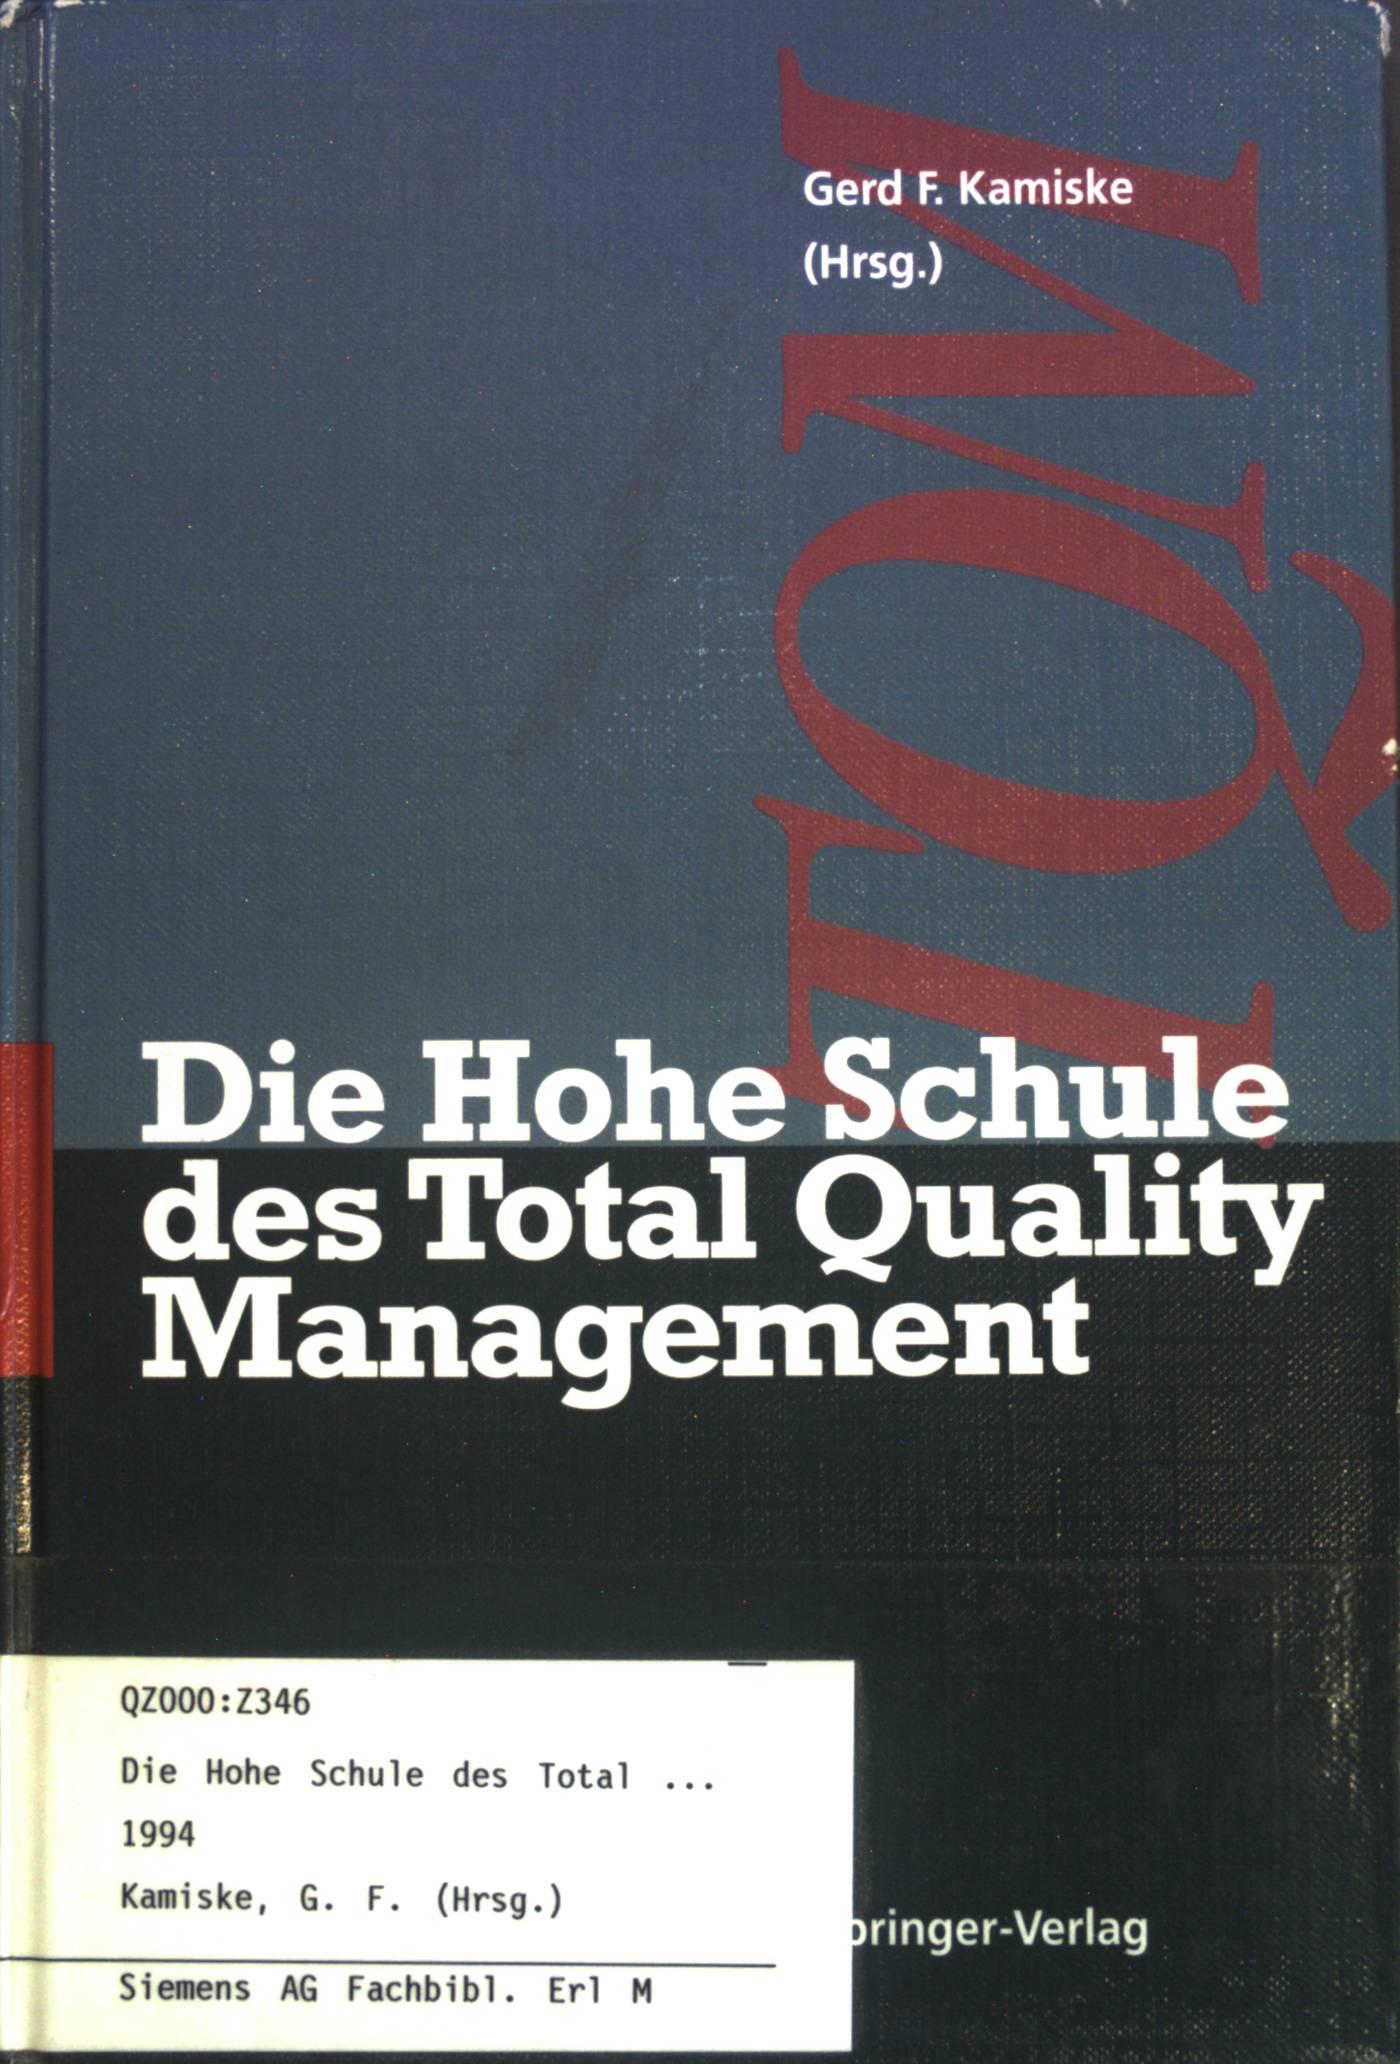 Die Hohe Schule des Total Quality Management.: Kamiske, Gerd F.: